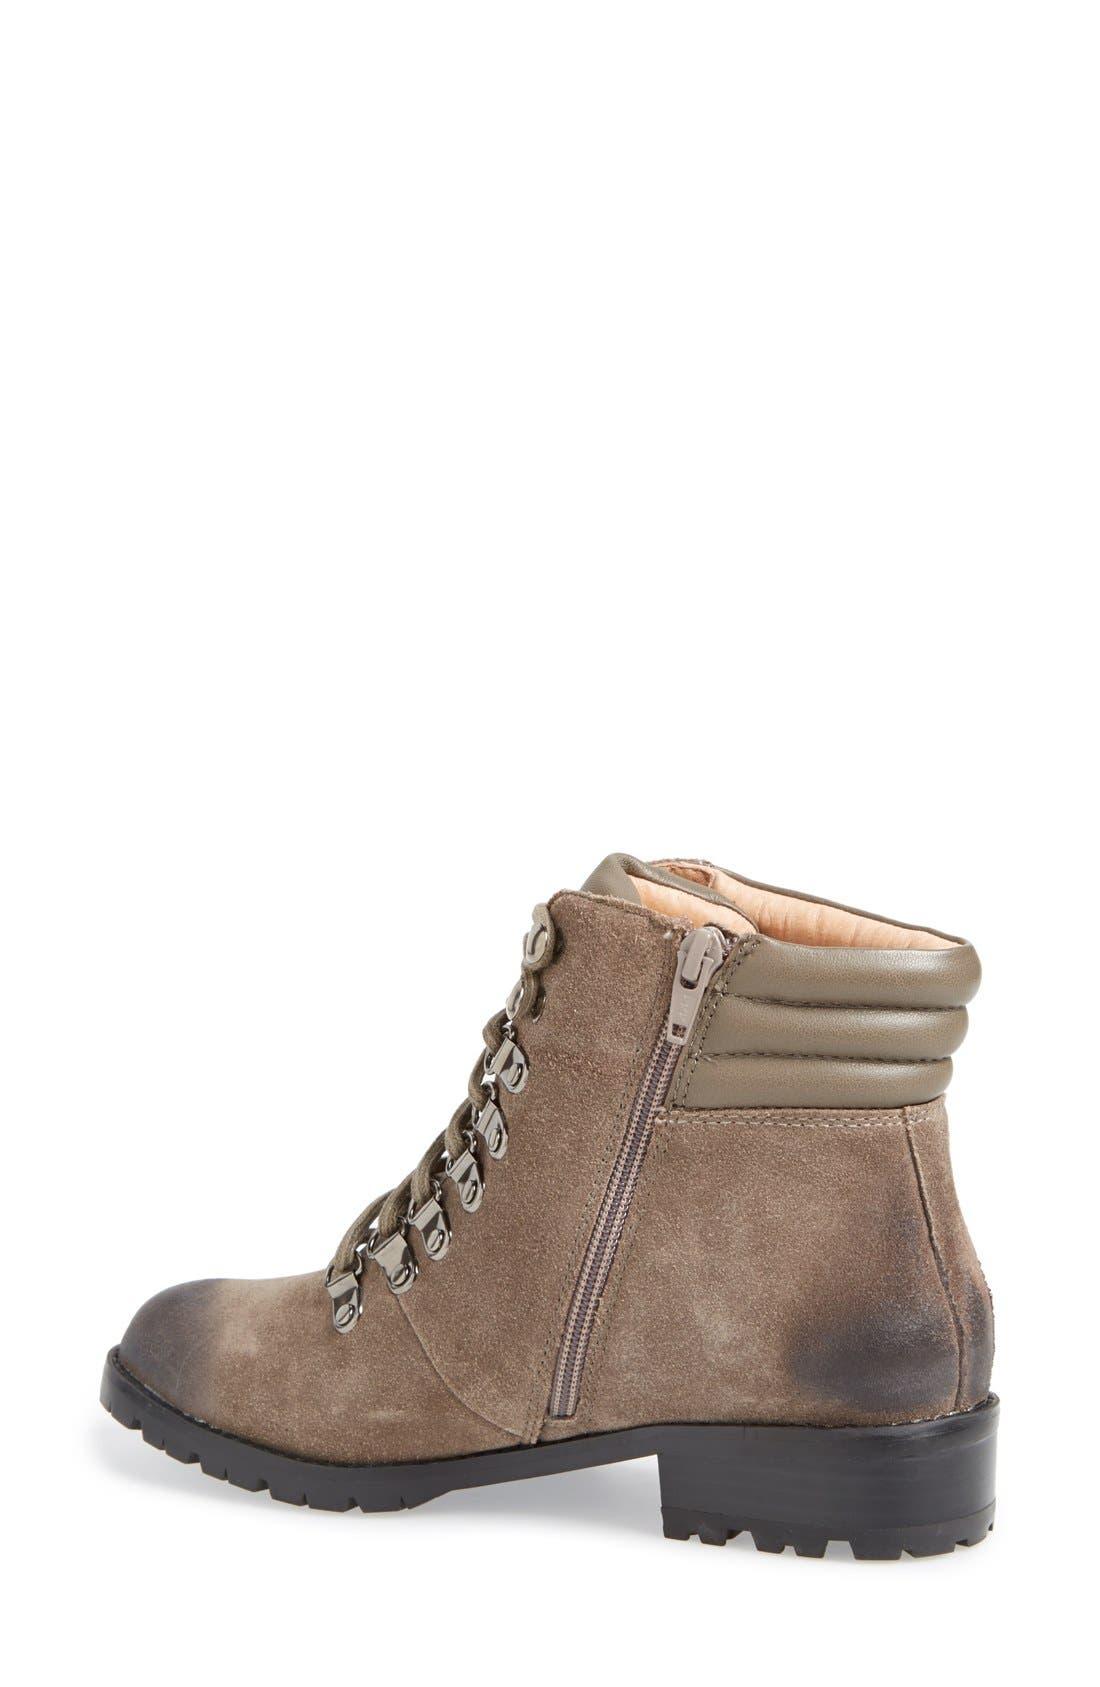 Alternate Image 2  - Corso Como 'Whisper' Hiking Boot (Women)